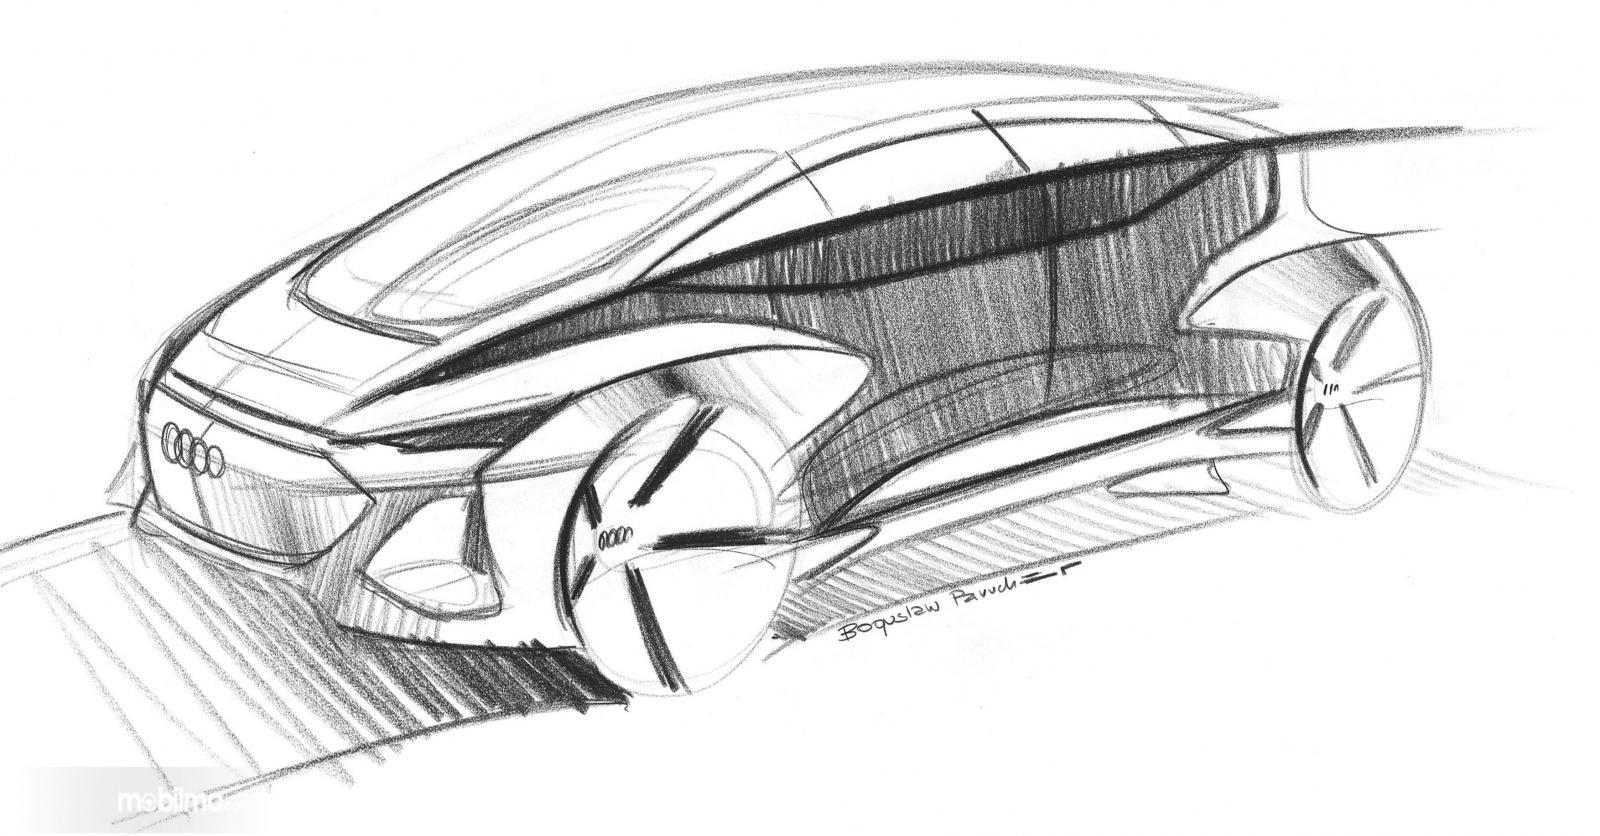 Gambar Sketsa mobil listrik otonom Audi yang diriis di laman resmi Audi sebelum diperkenalkan wujud fisiknya di Auto Shanghai 2019